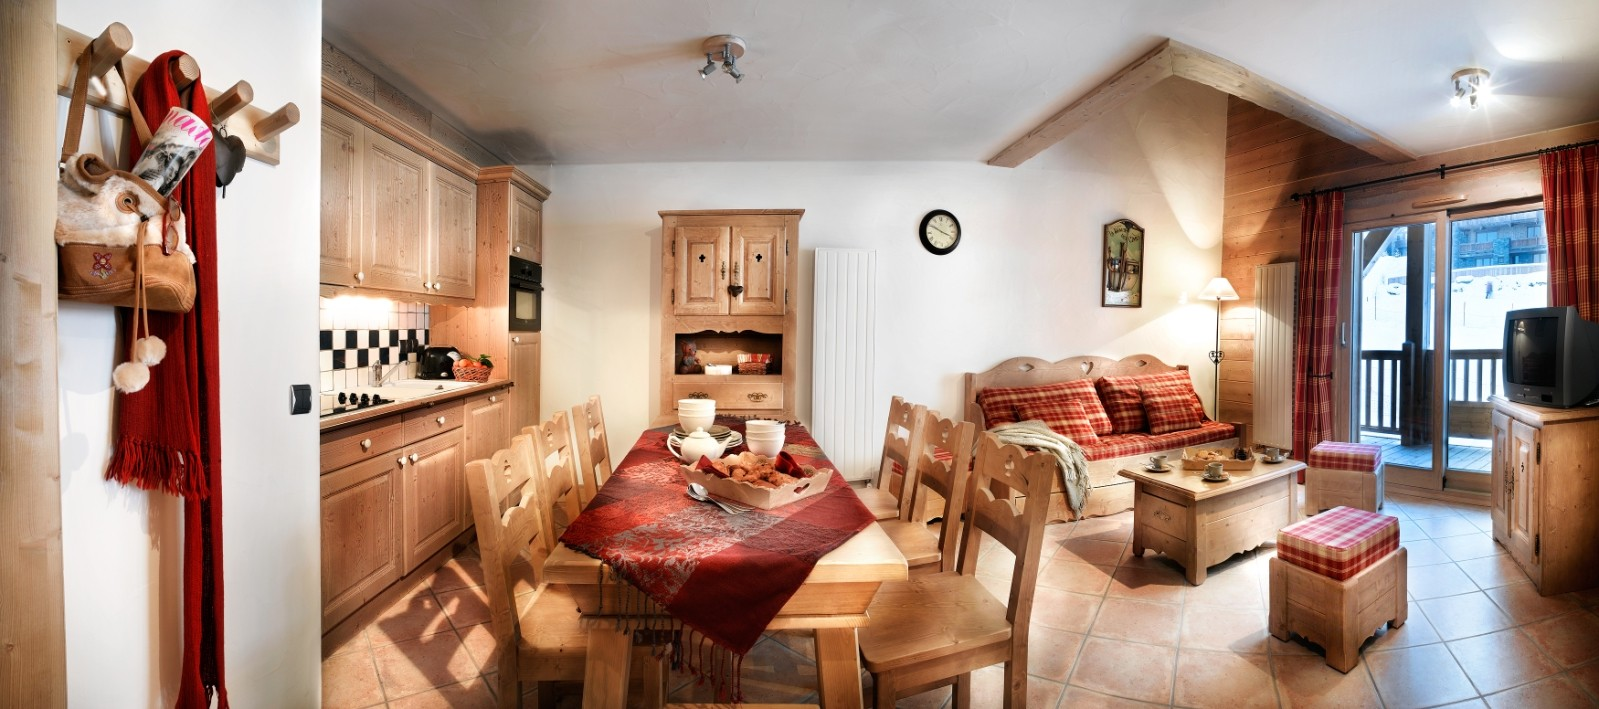 Sainte Foy Tarentaise Location Appartement Luxe Lemanita Salon